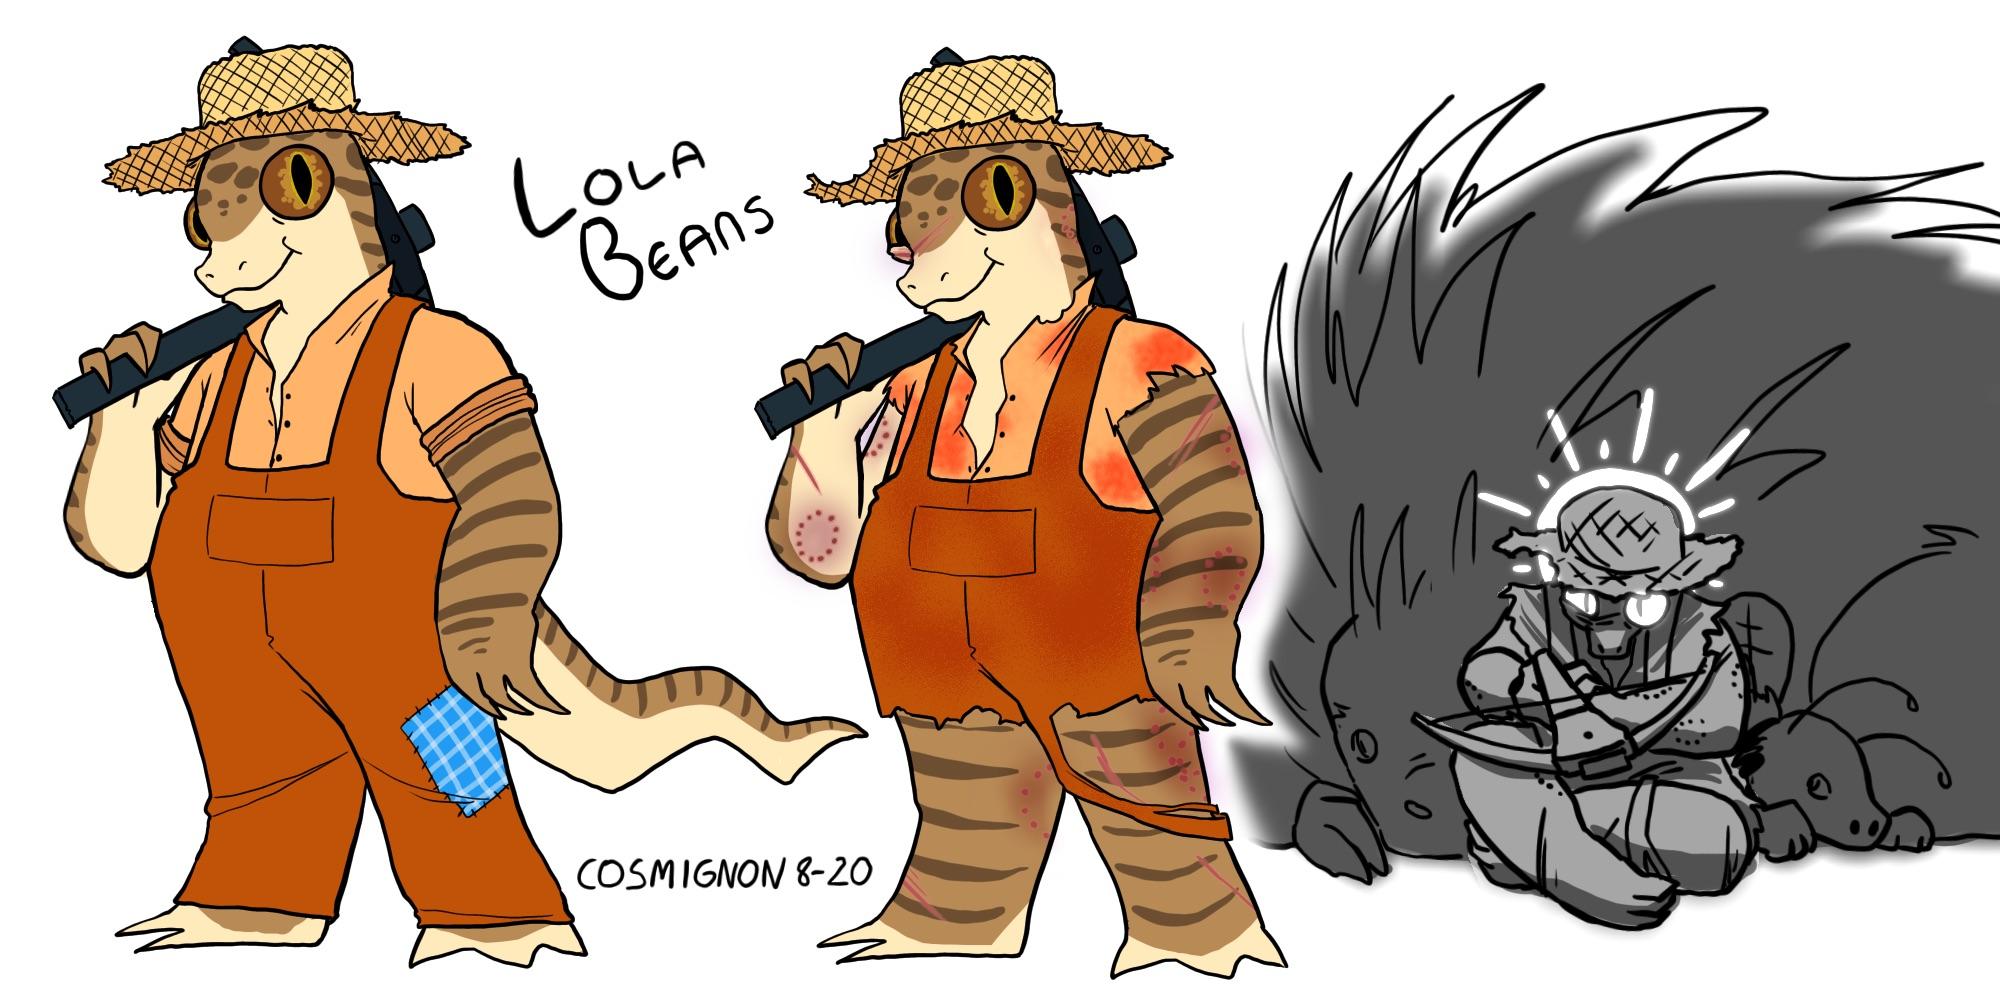 Lola Beans